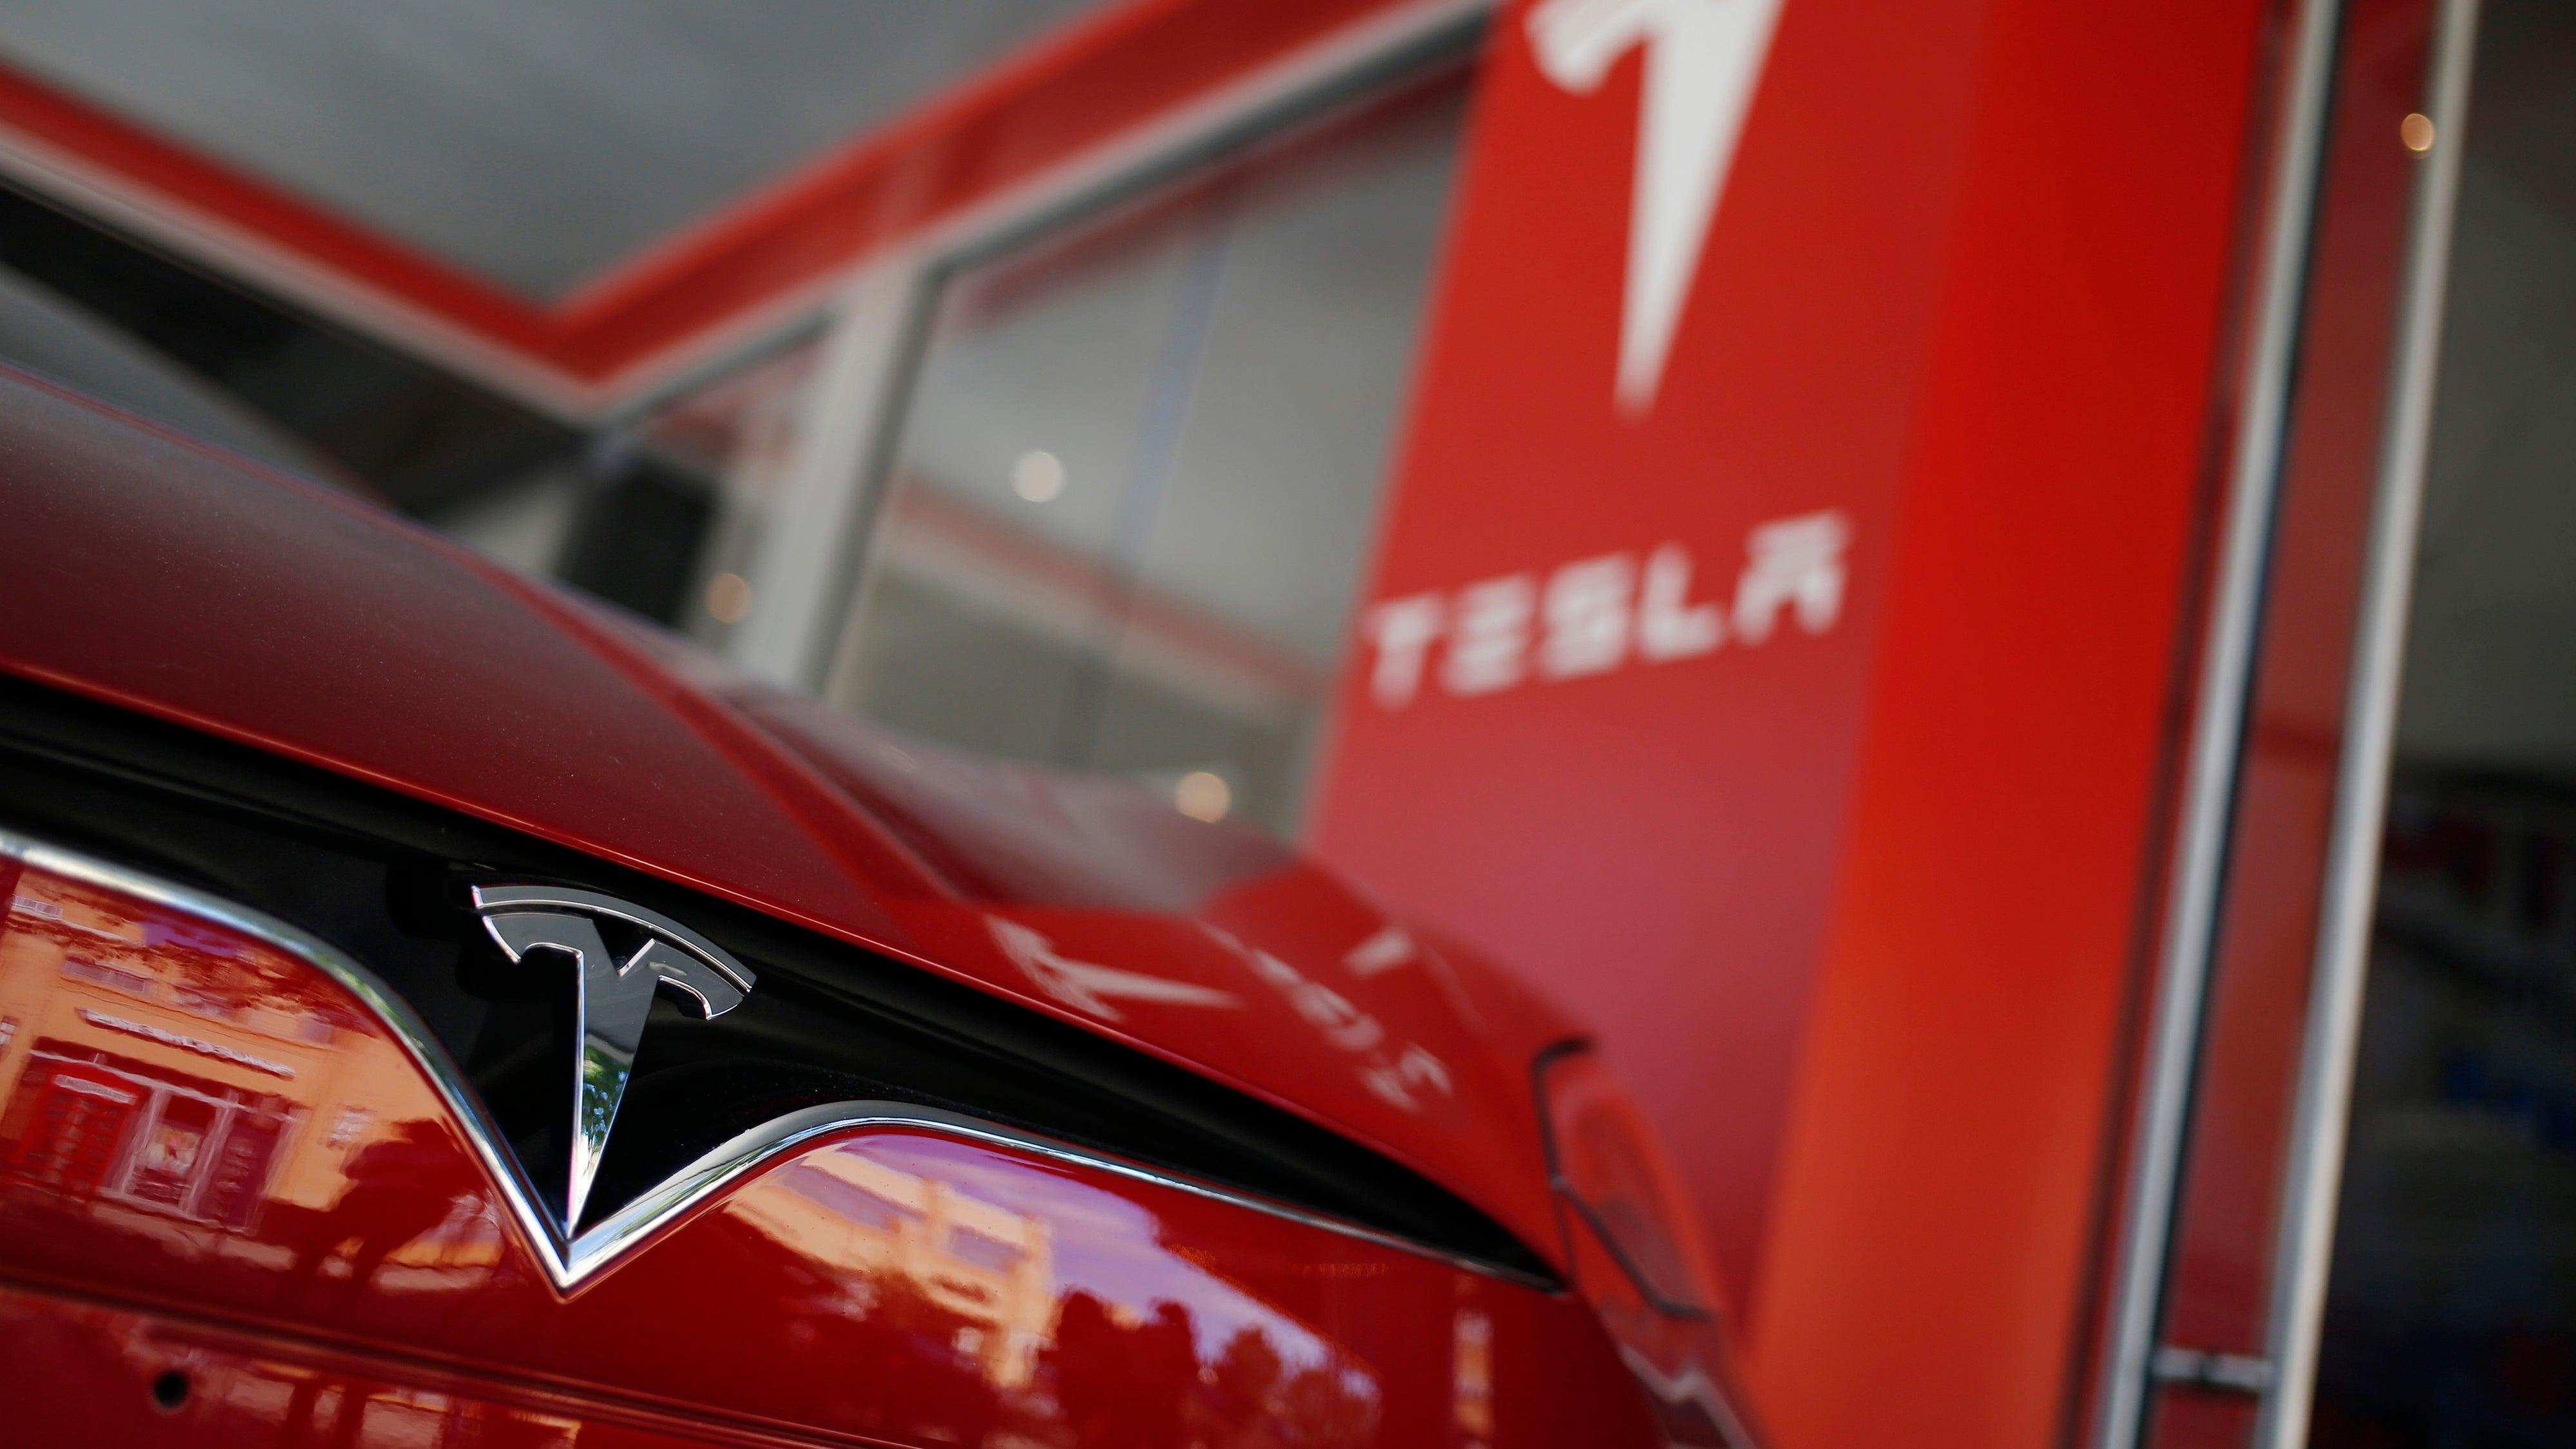 Tesla's autopilot system under scrutiny in fatal China crash